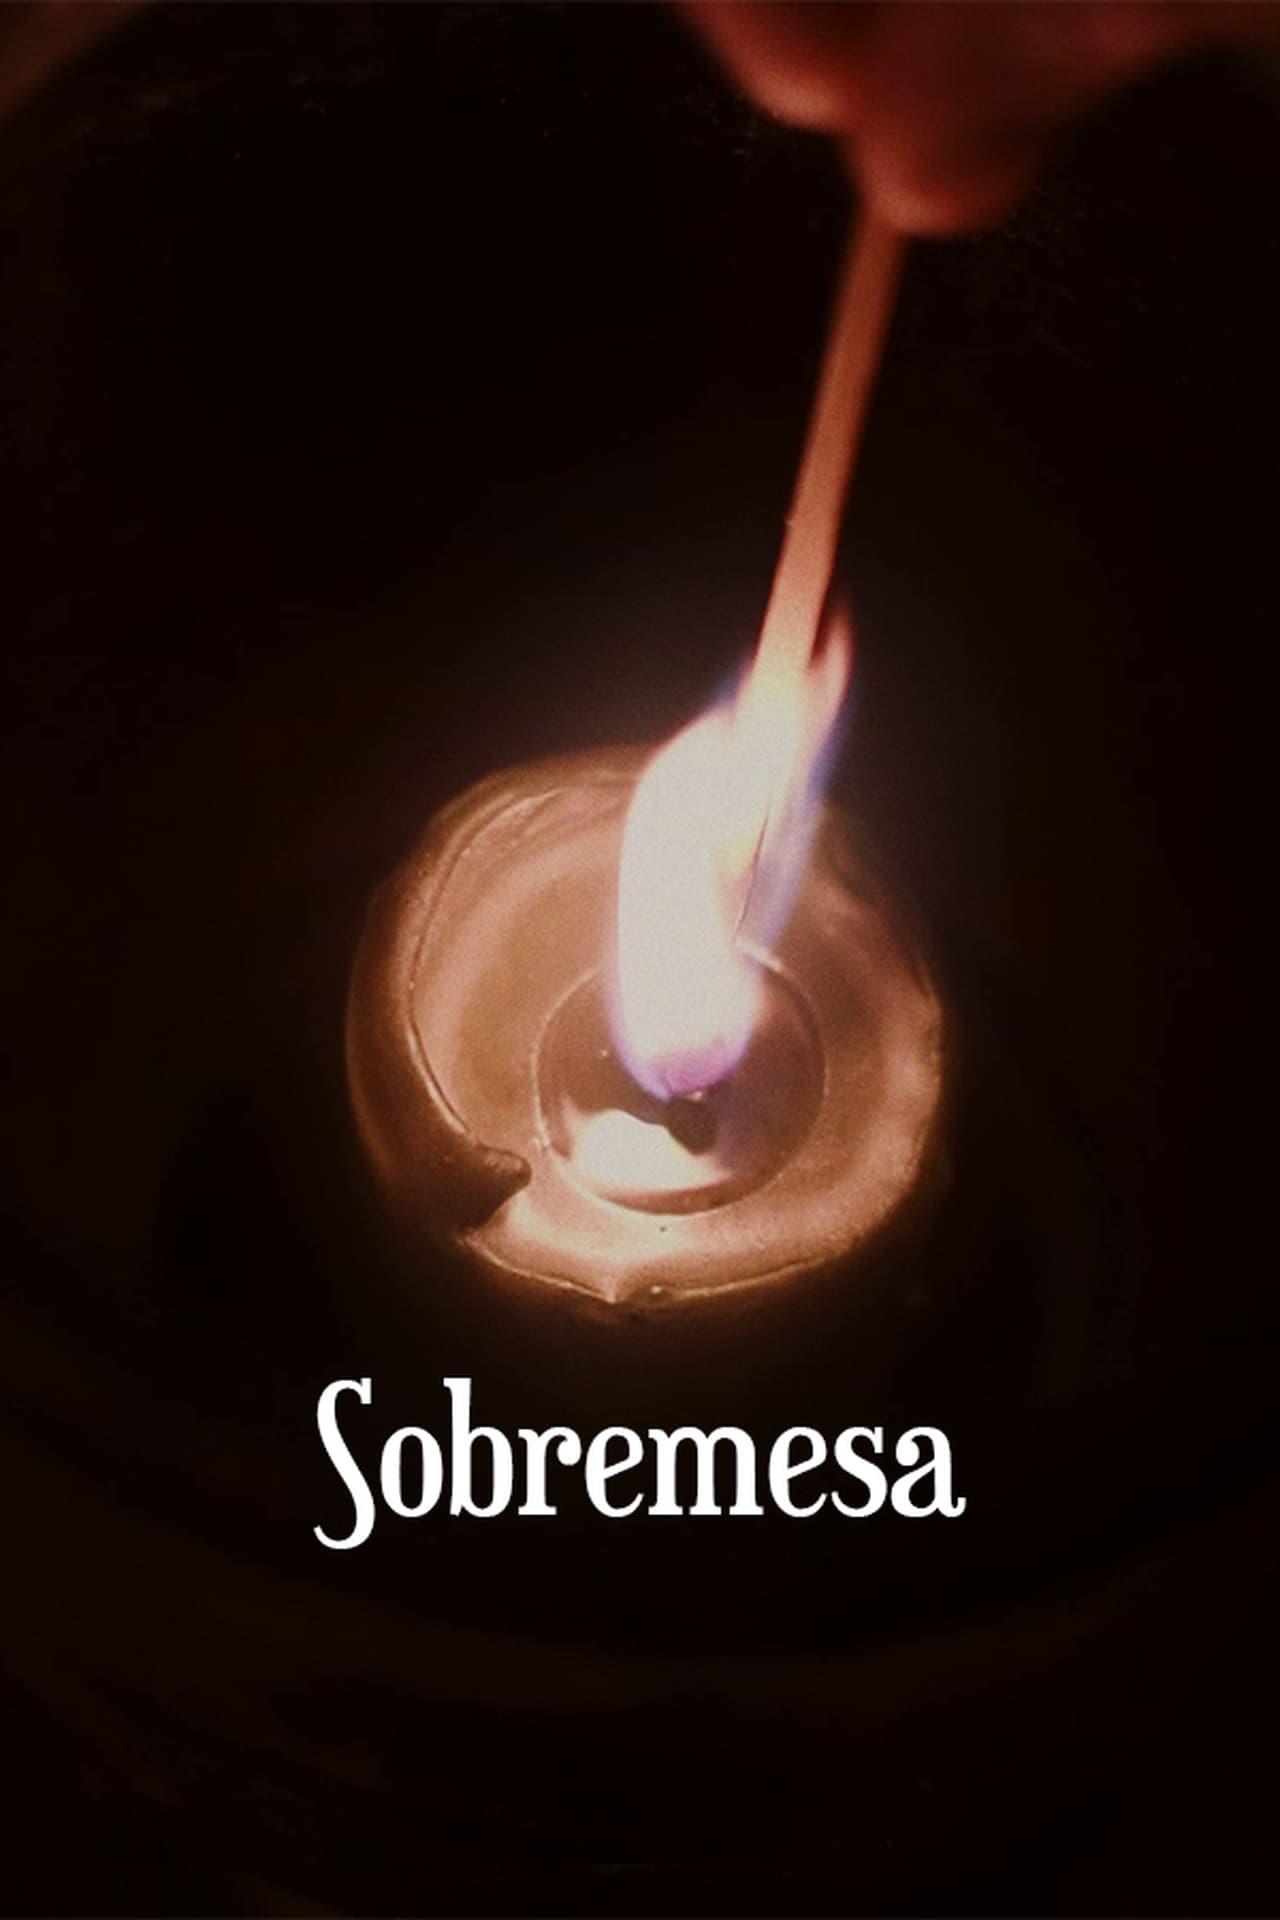 No manches frida 2 pelicula completa en español latino cinemitas gratis